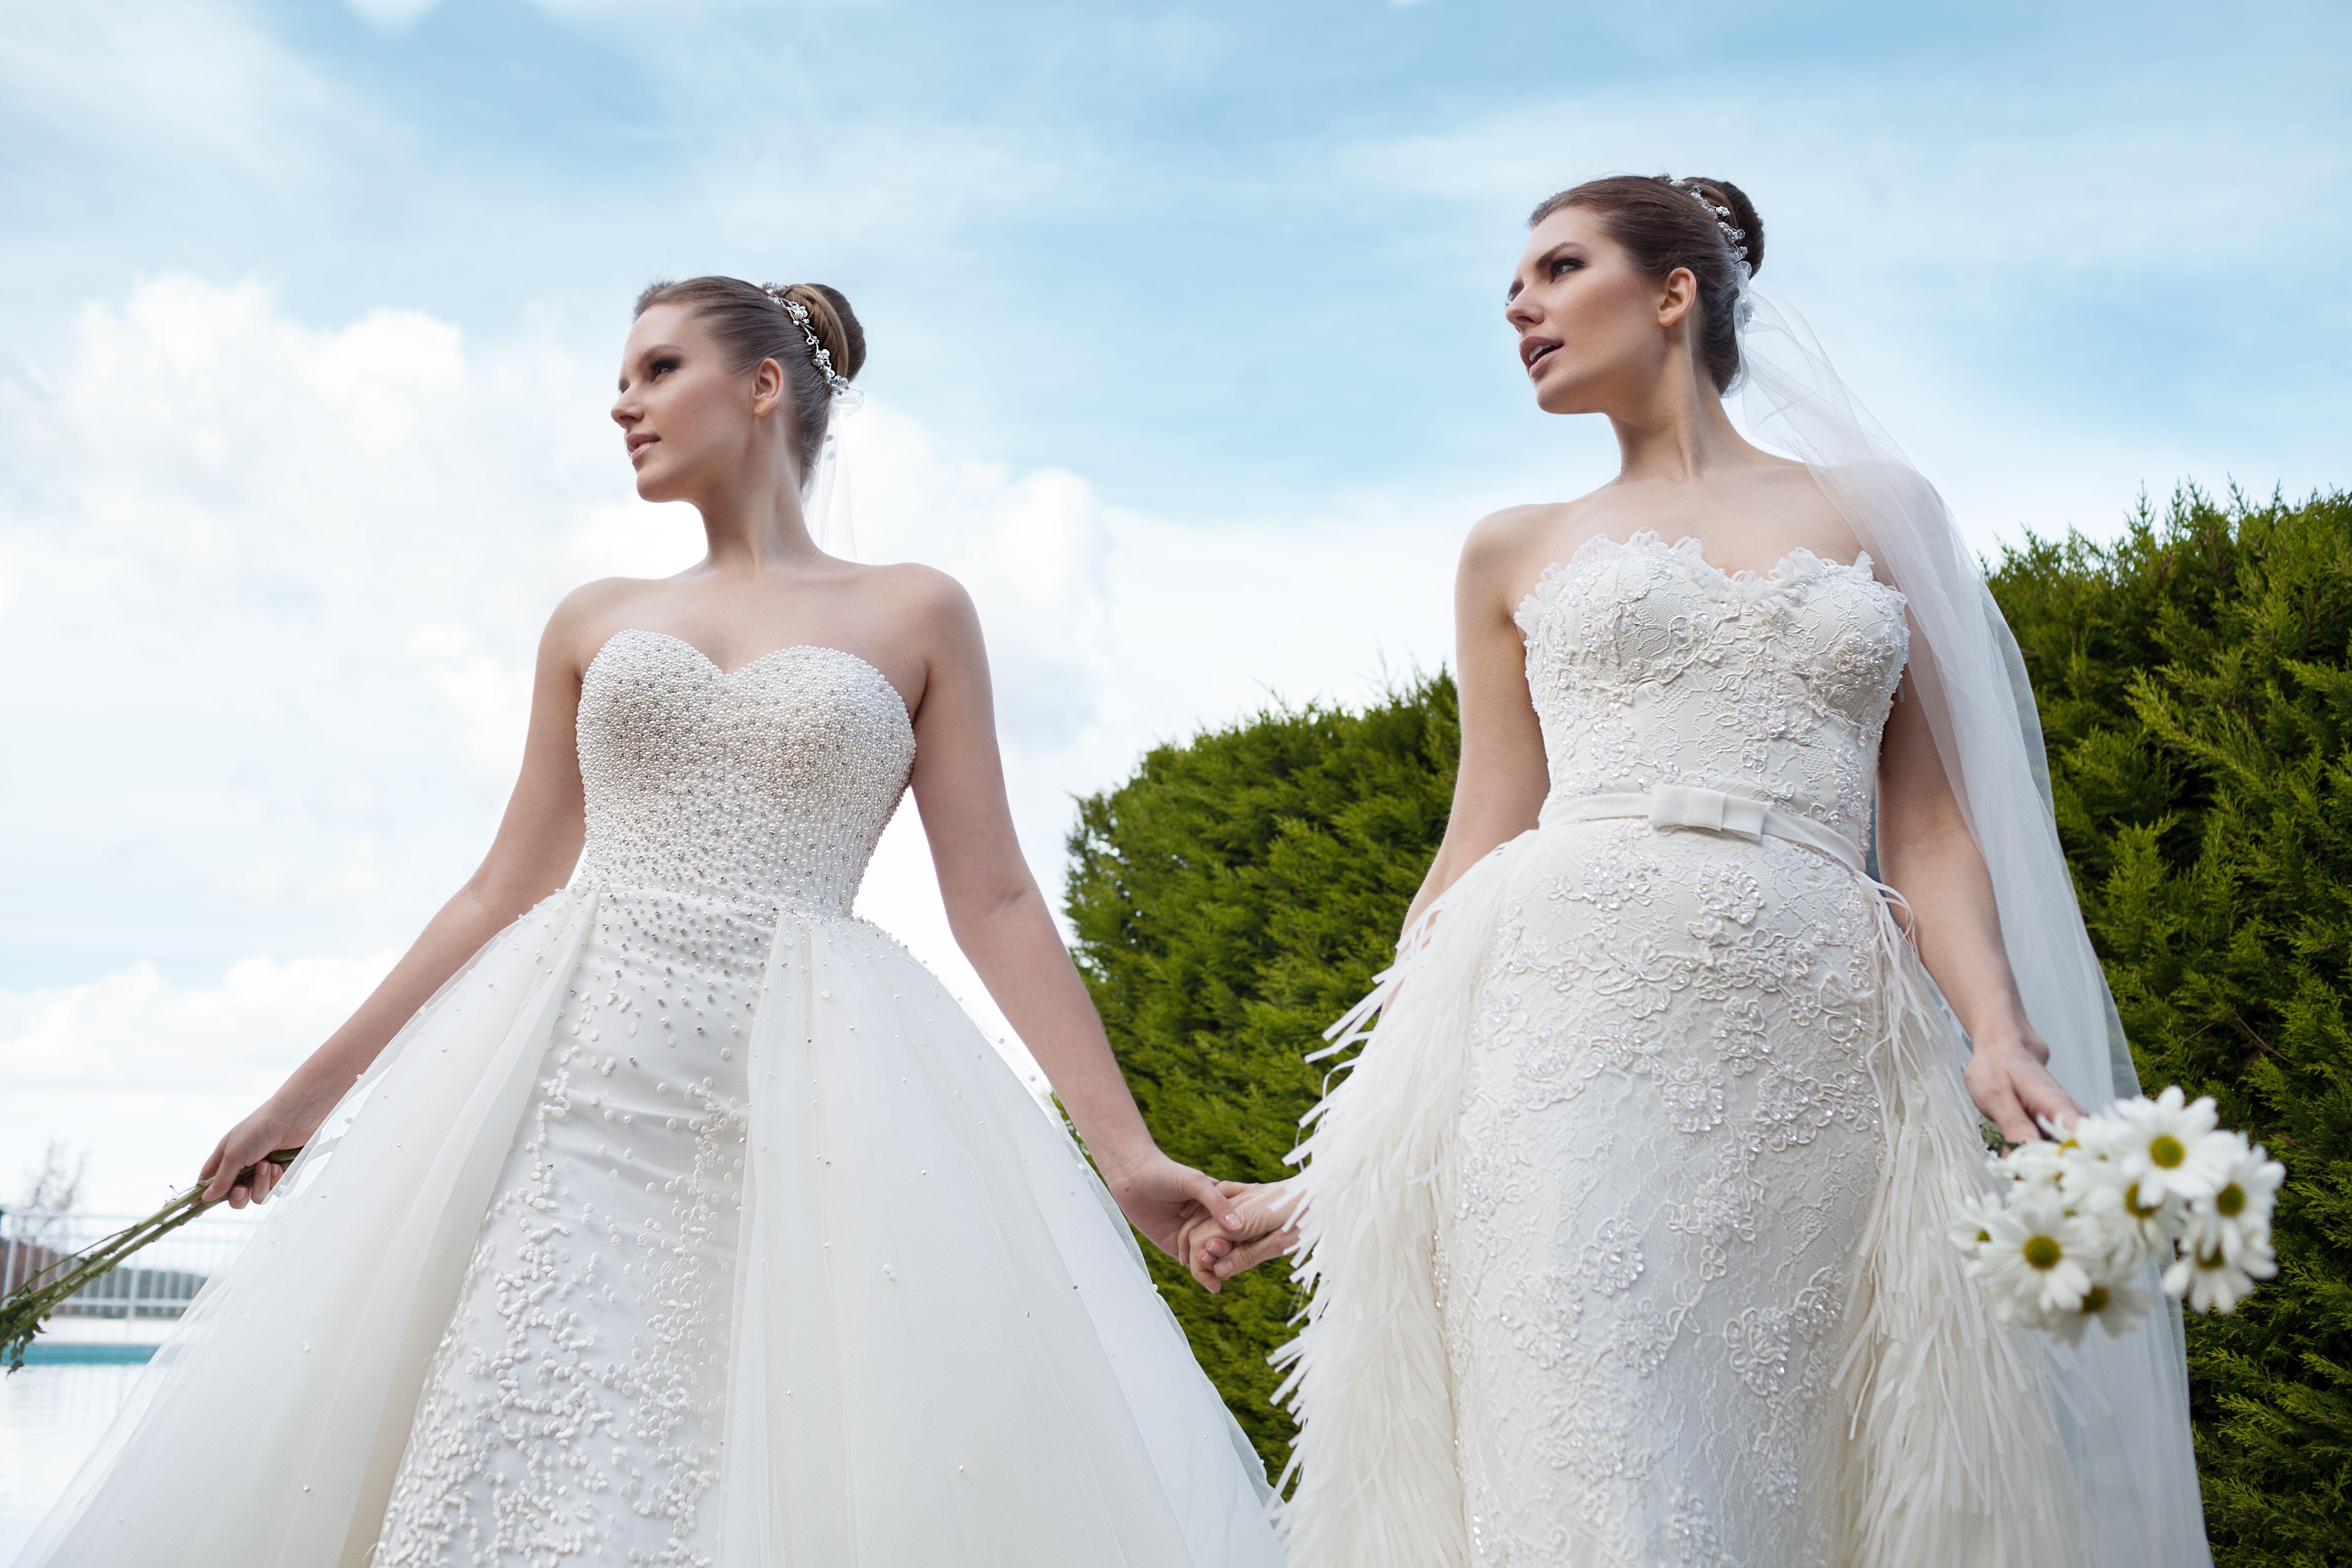 Wedding dresses collection wedding dress designs nova bella bridal